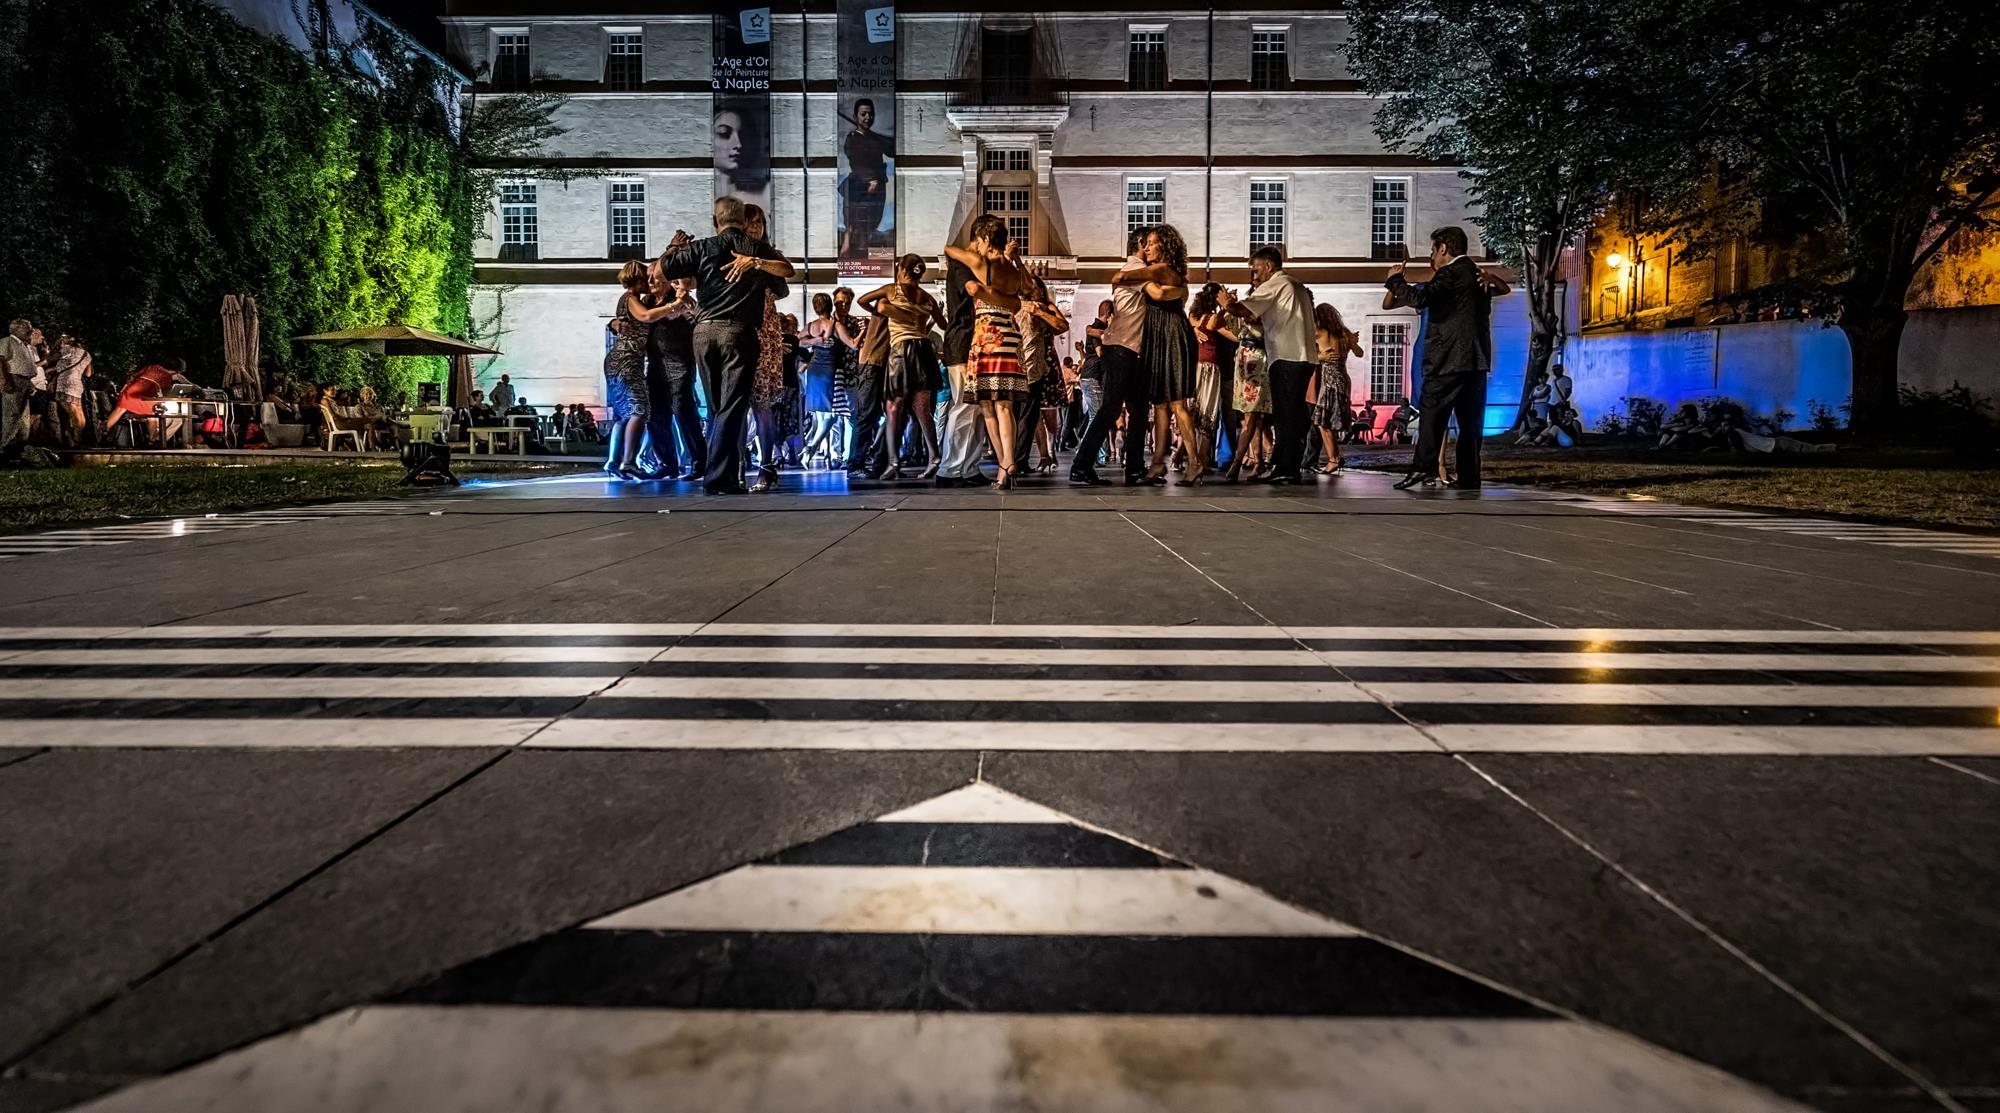 Photo 4 la milonga du musee 2015 pierre doussot el sal n de tango rufino luro cambaceres - Danse de salon montpellier ...